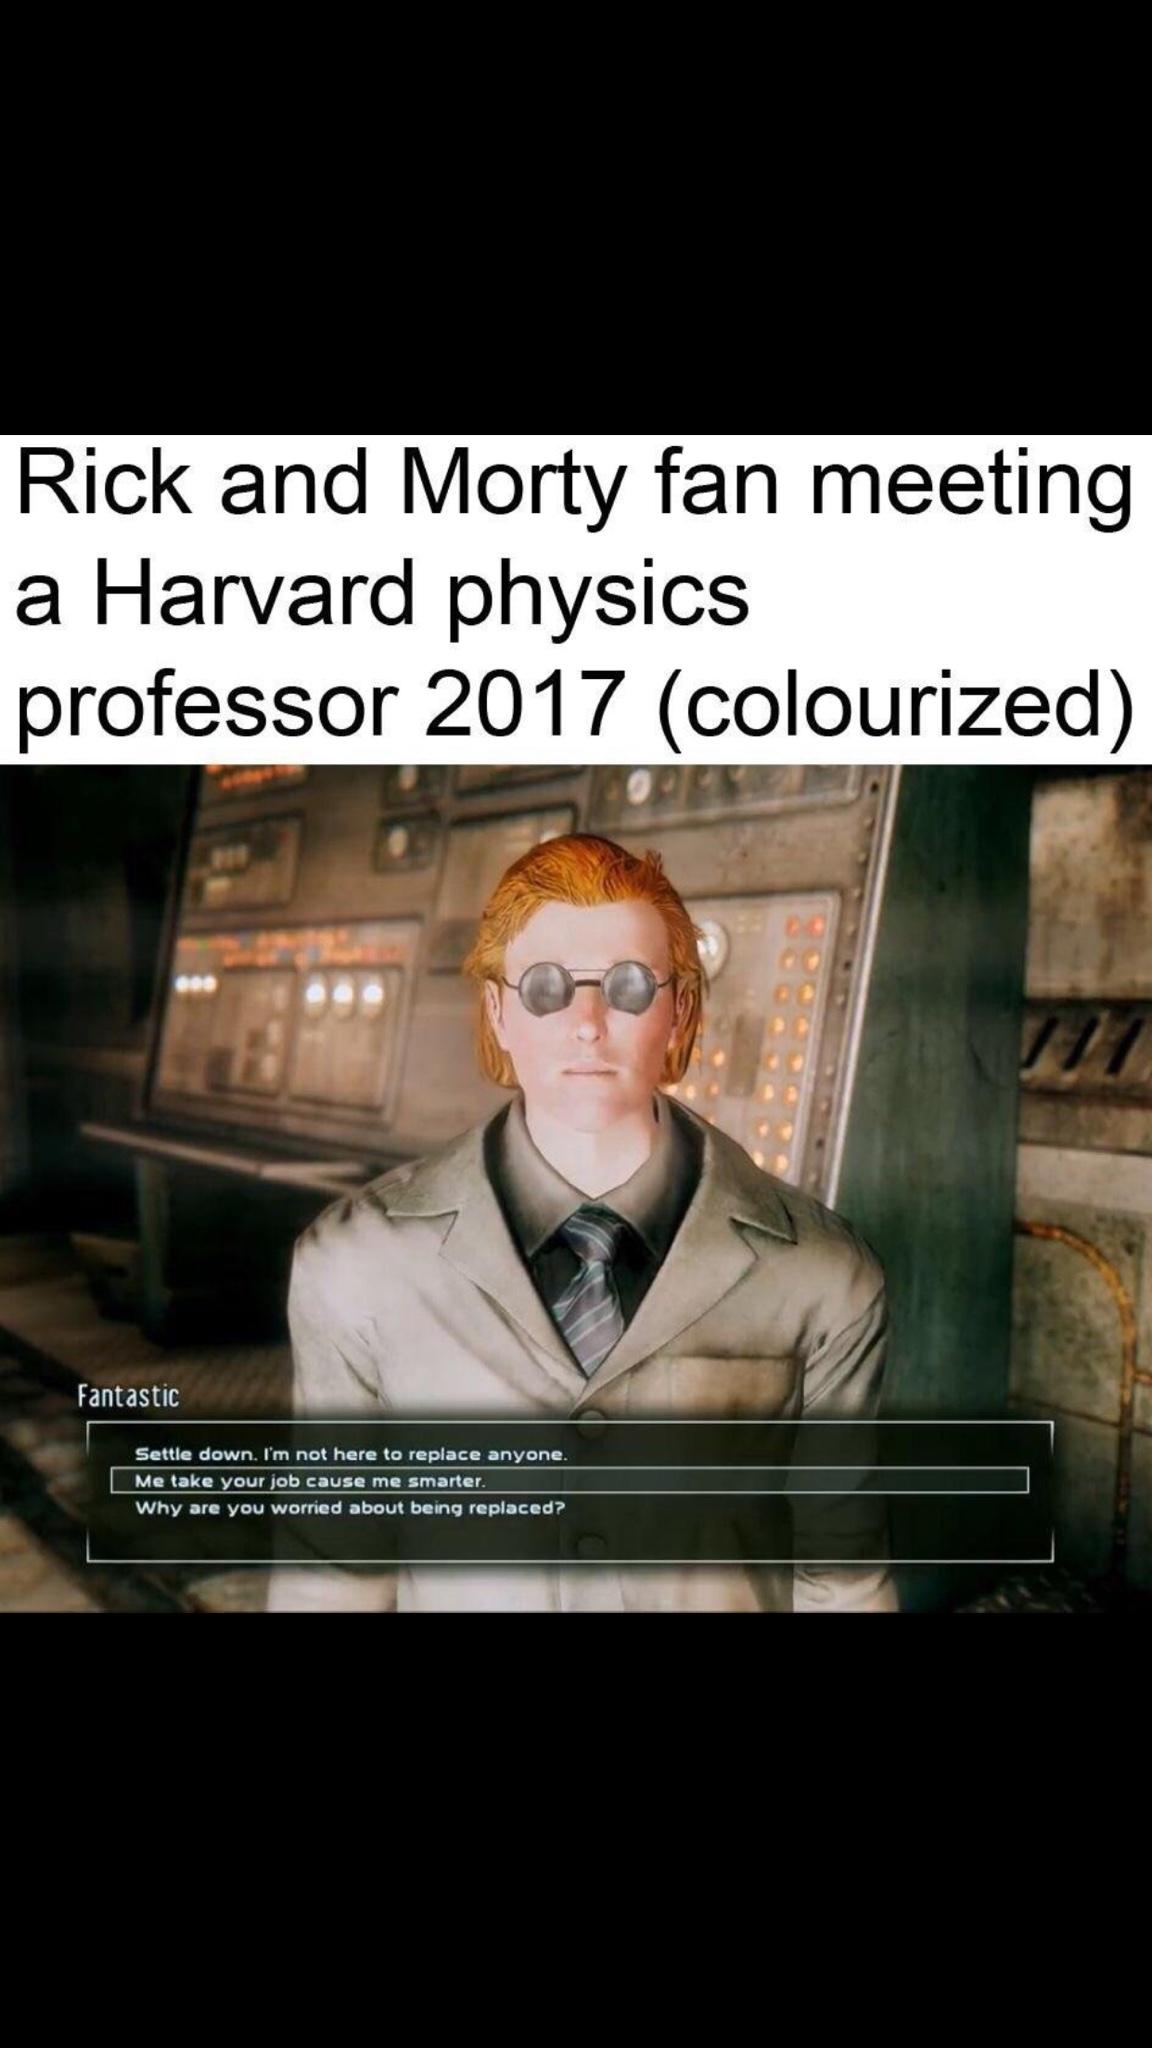 PICKLE RIIIIIIIIIIIIIIIIIIIIIIIIIIIIIIIIIIIIIIIIIIIIIIIIIIIIIIIIIIIICK - meme